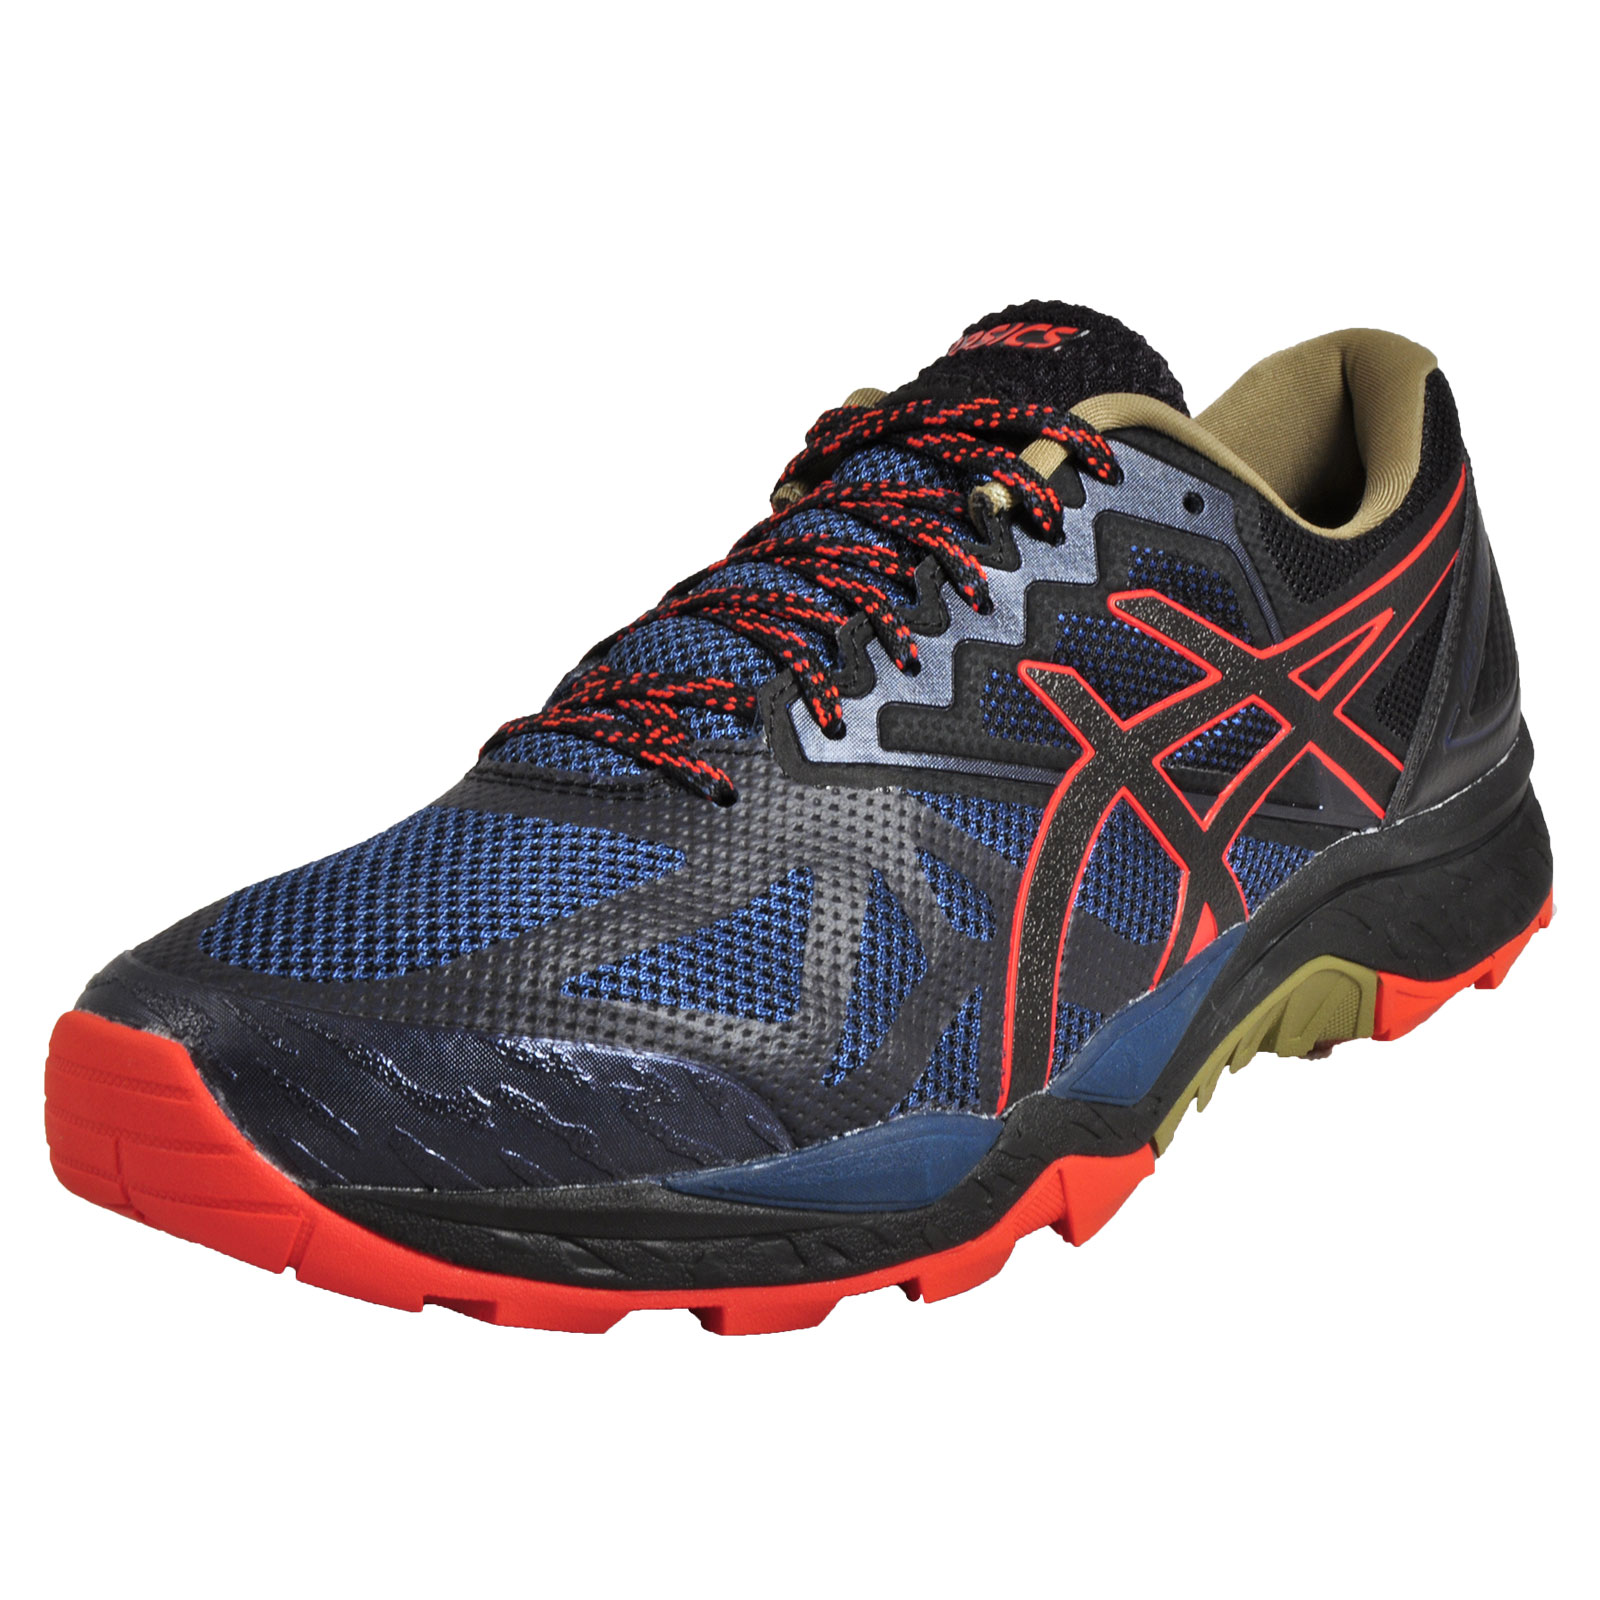 Asics Gel FujiTrabuco 6 Men's High Performance All Terrain Trail Running  Shoes Blue